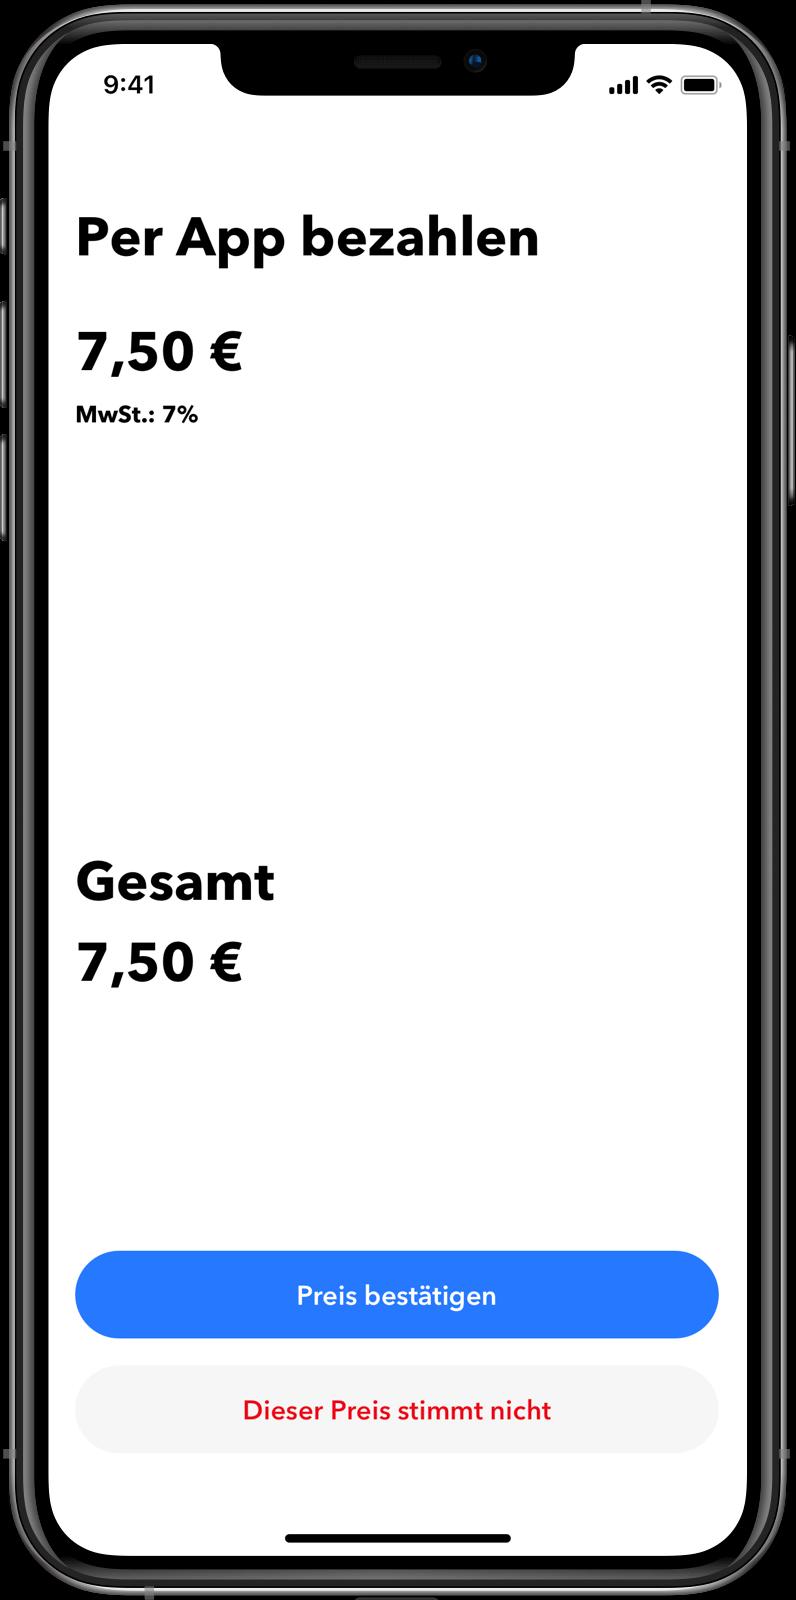 Taxi Software Kunden-App: Nahtlose In-App Bezahlungen